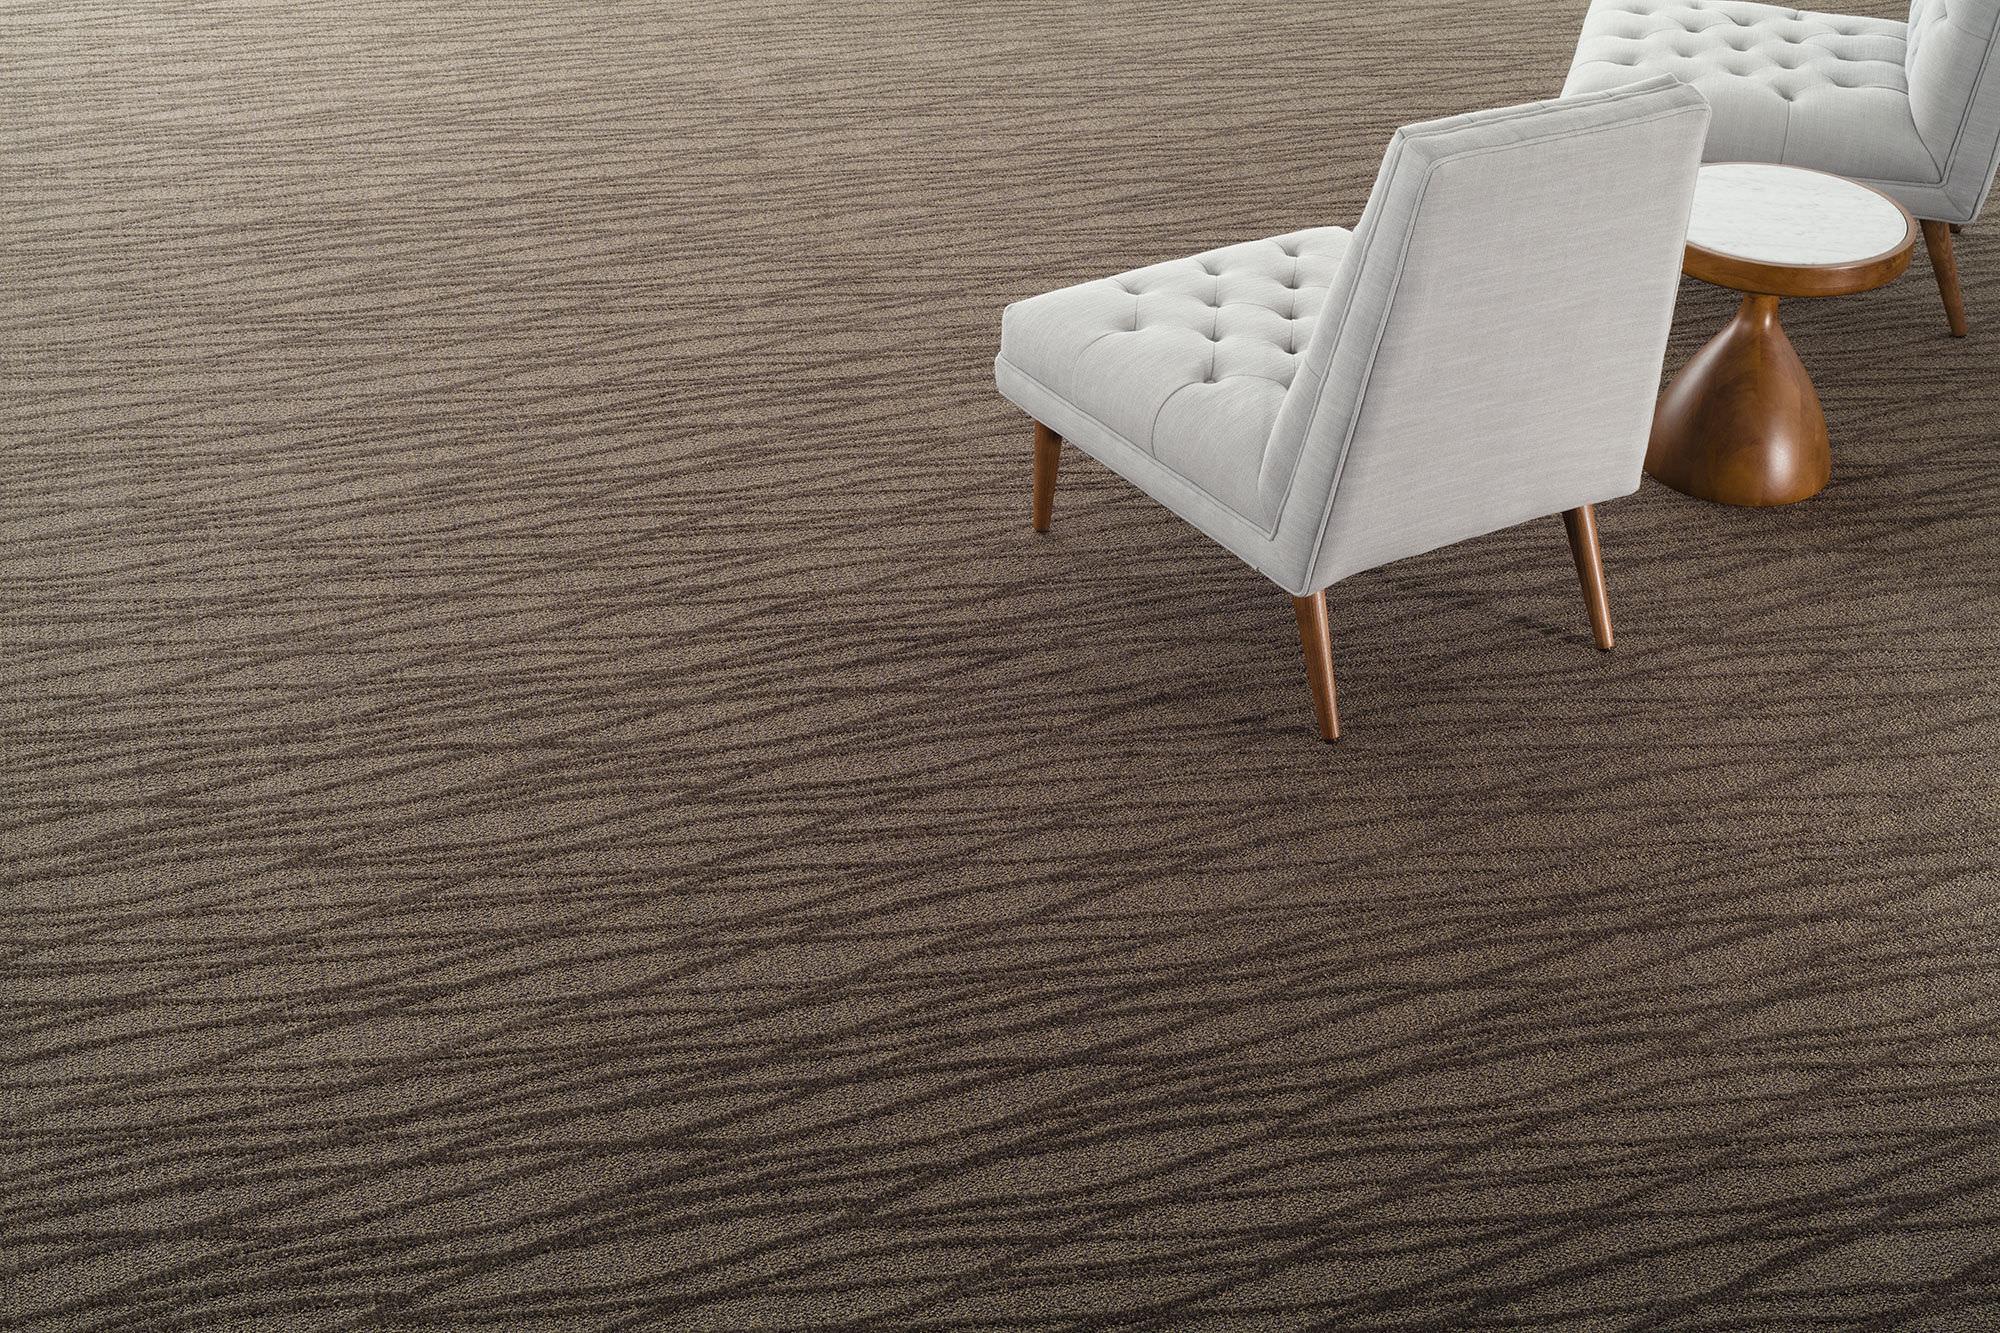 carpet designs srs cool carpets srs modern cool rugs teenagers ace spades skull design modern cool